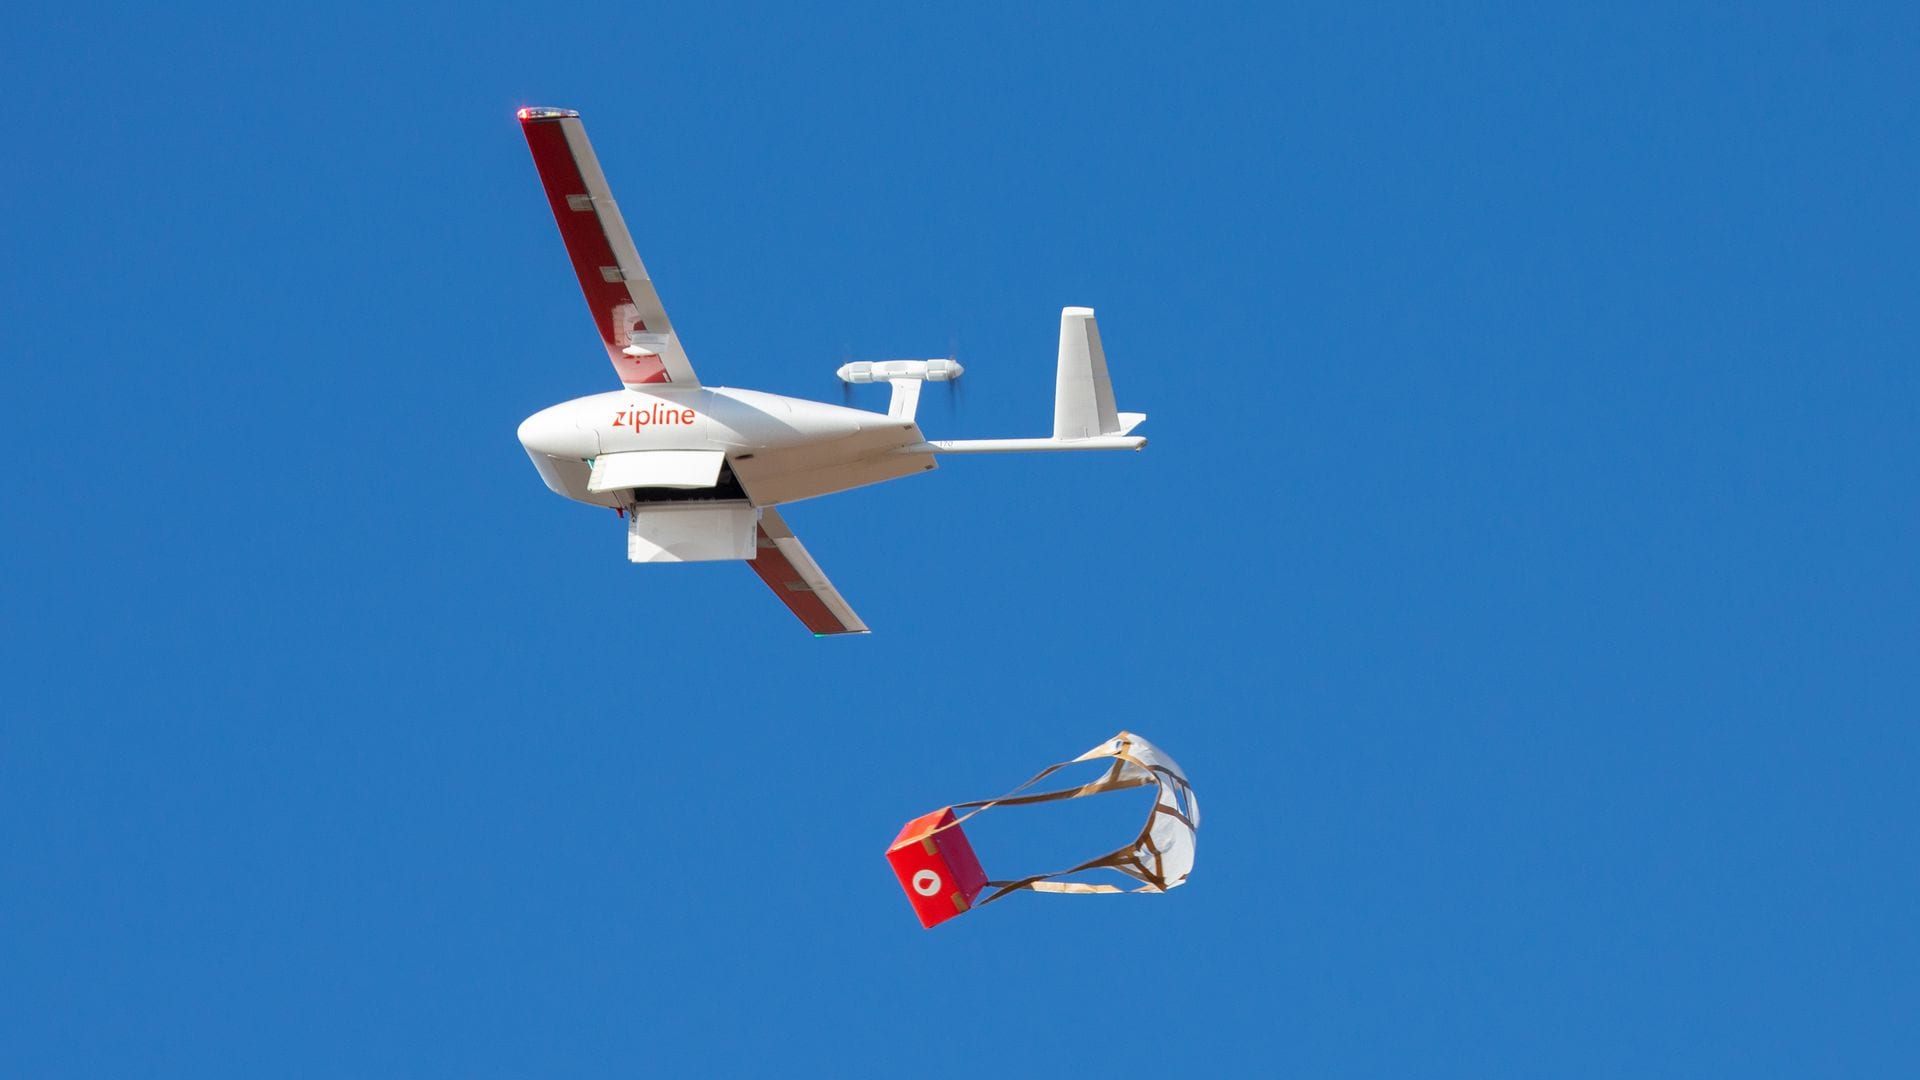 Ghana uses drones from Zipline to enable faster coronavirus testing